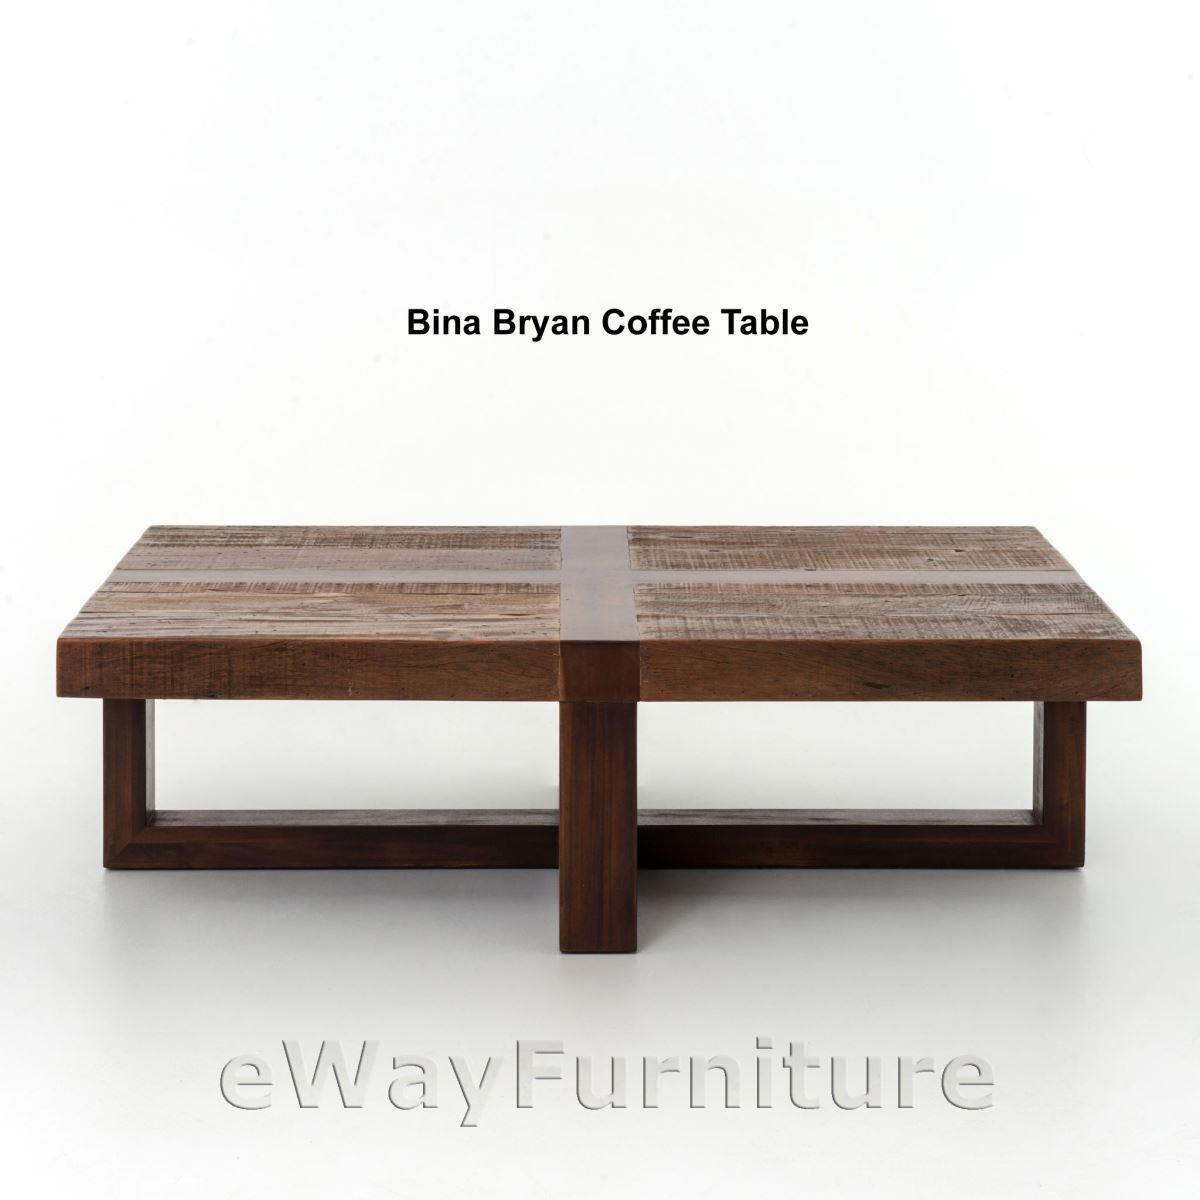 Bryan Coffee Net Worth